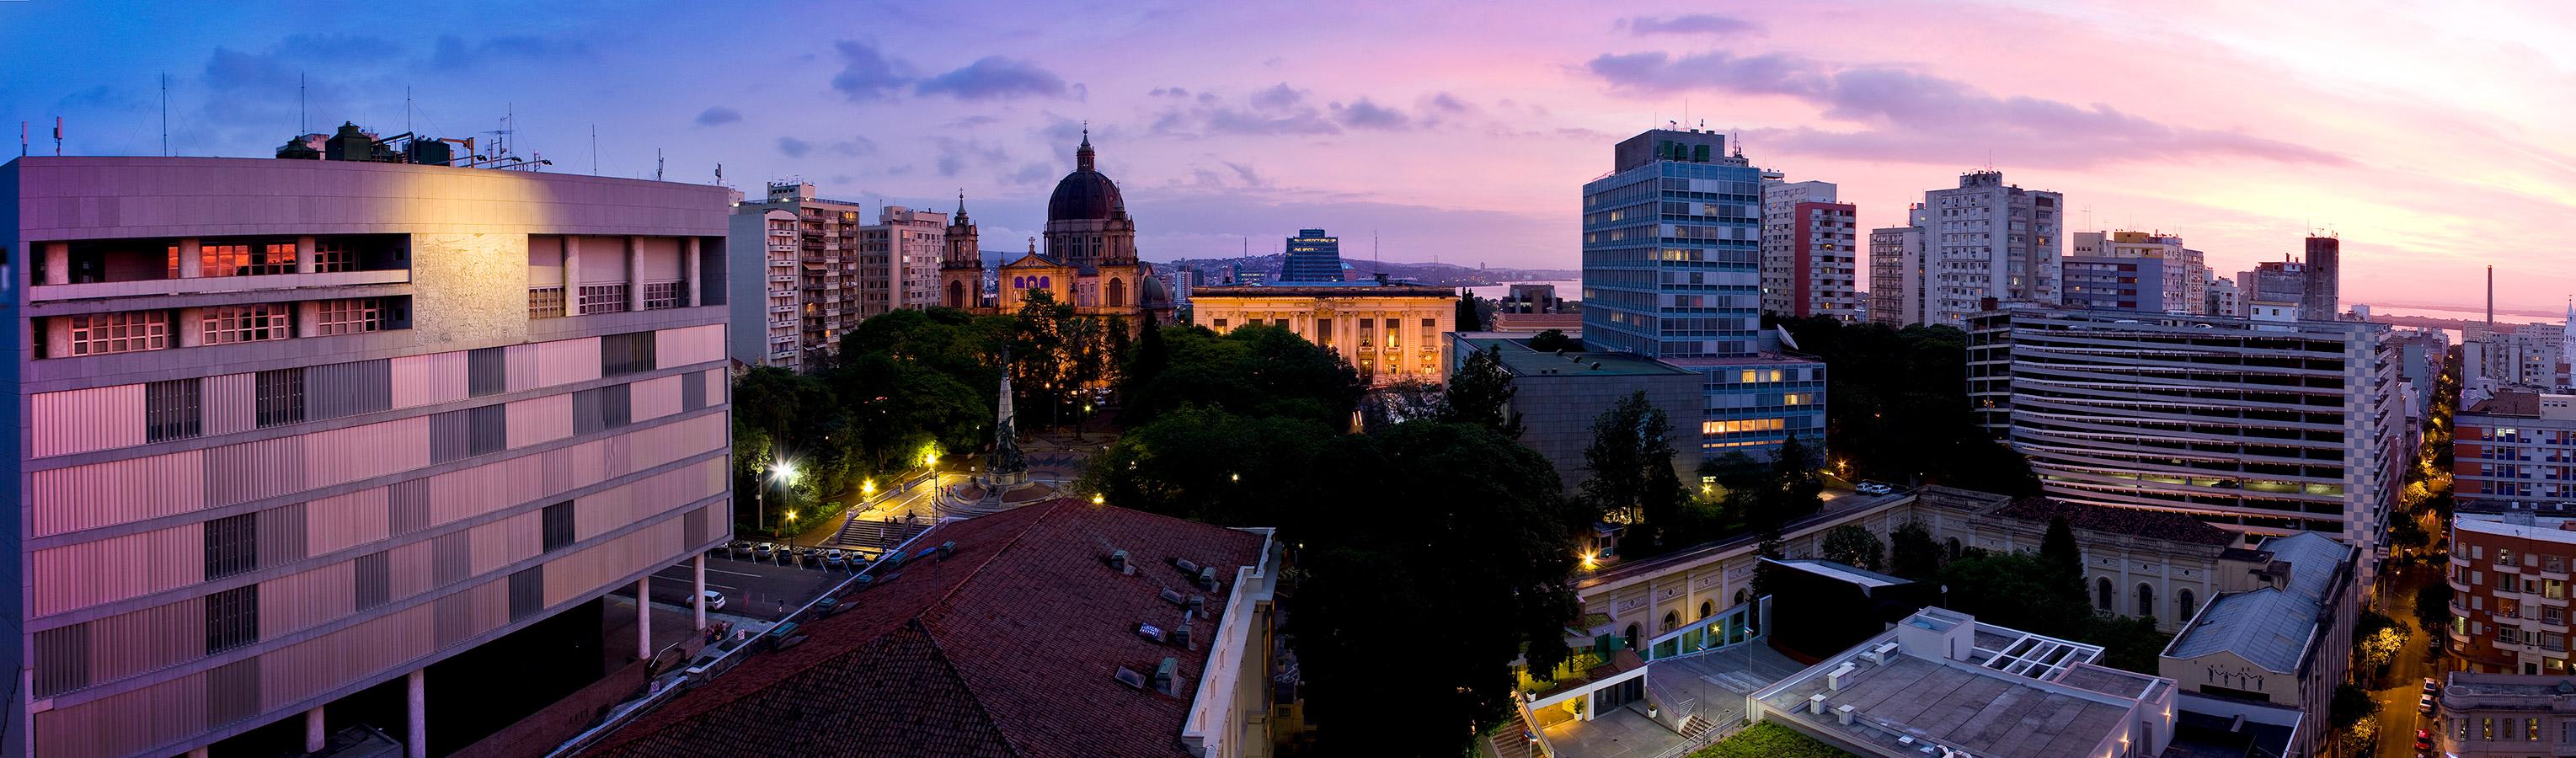 Centro de Porto Alegre - Panorâmica